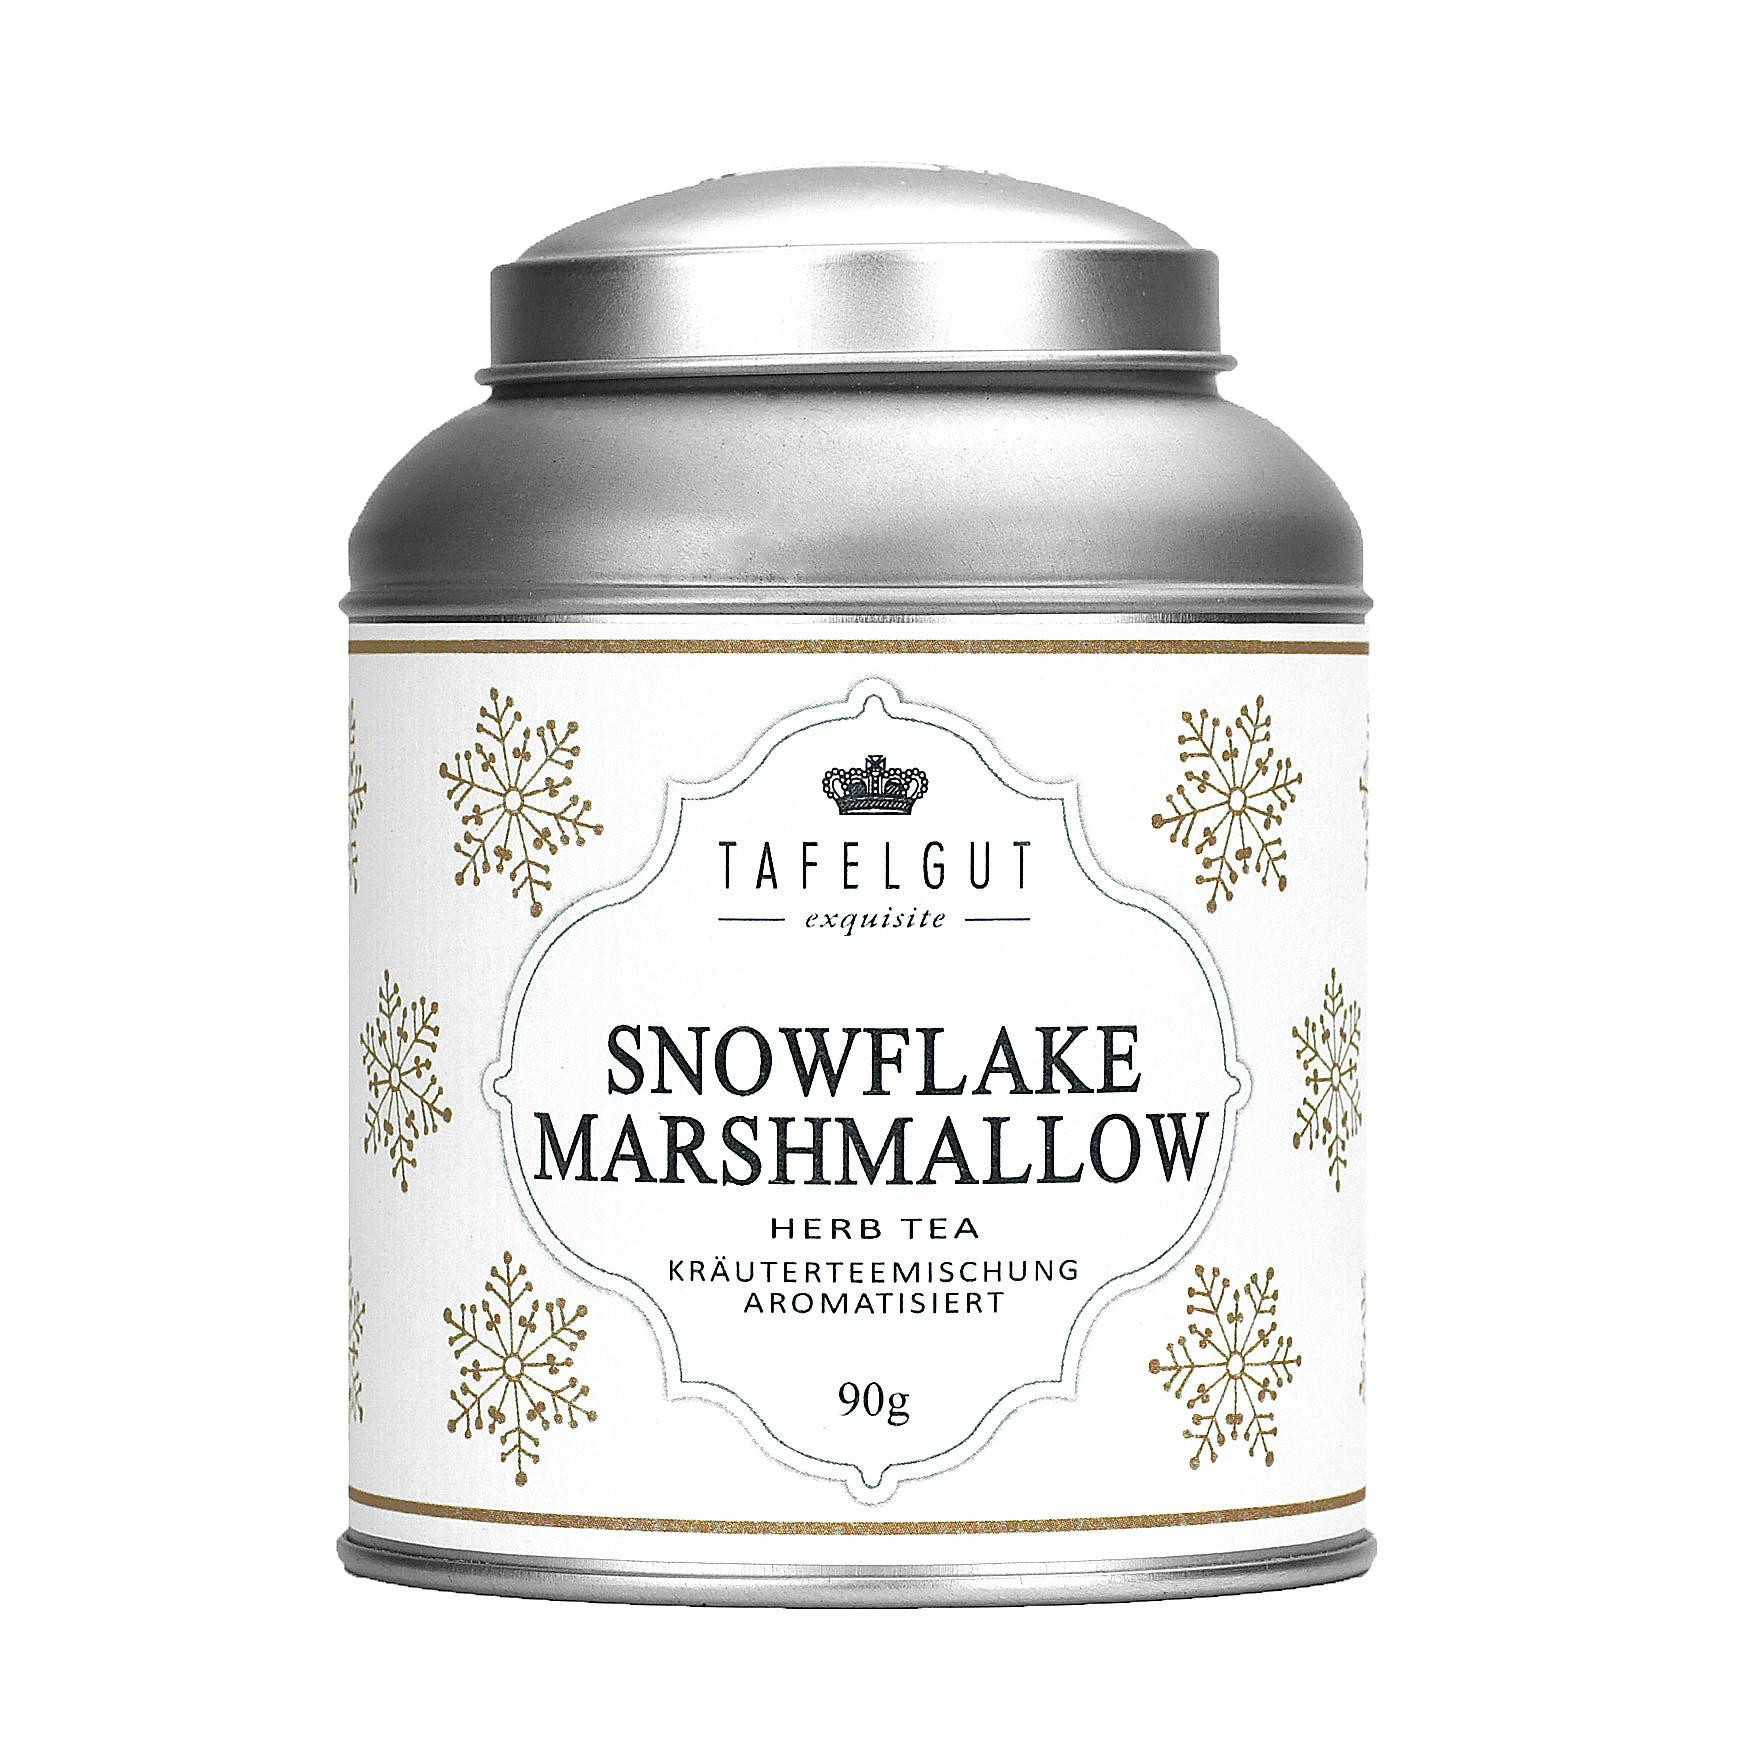 TAFELGUT Bylinný čaj Snowflake marshmallow - 90gr, krémová barva, kov